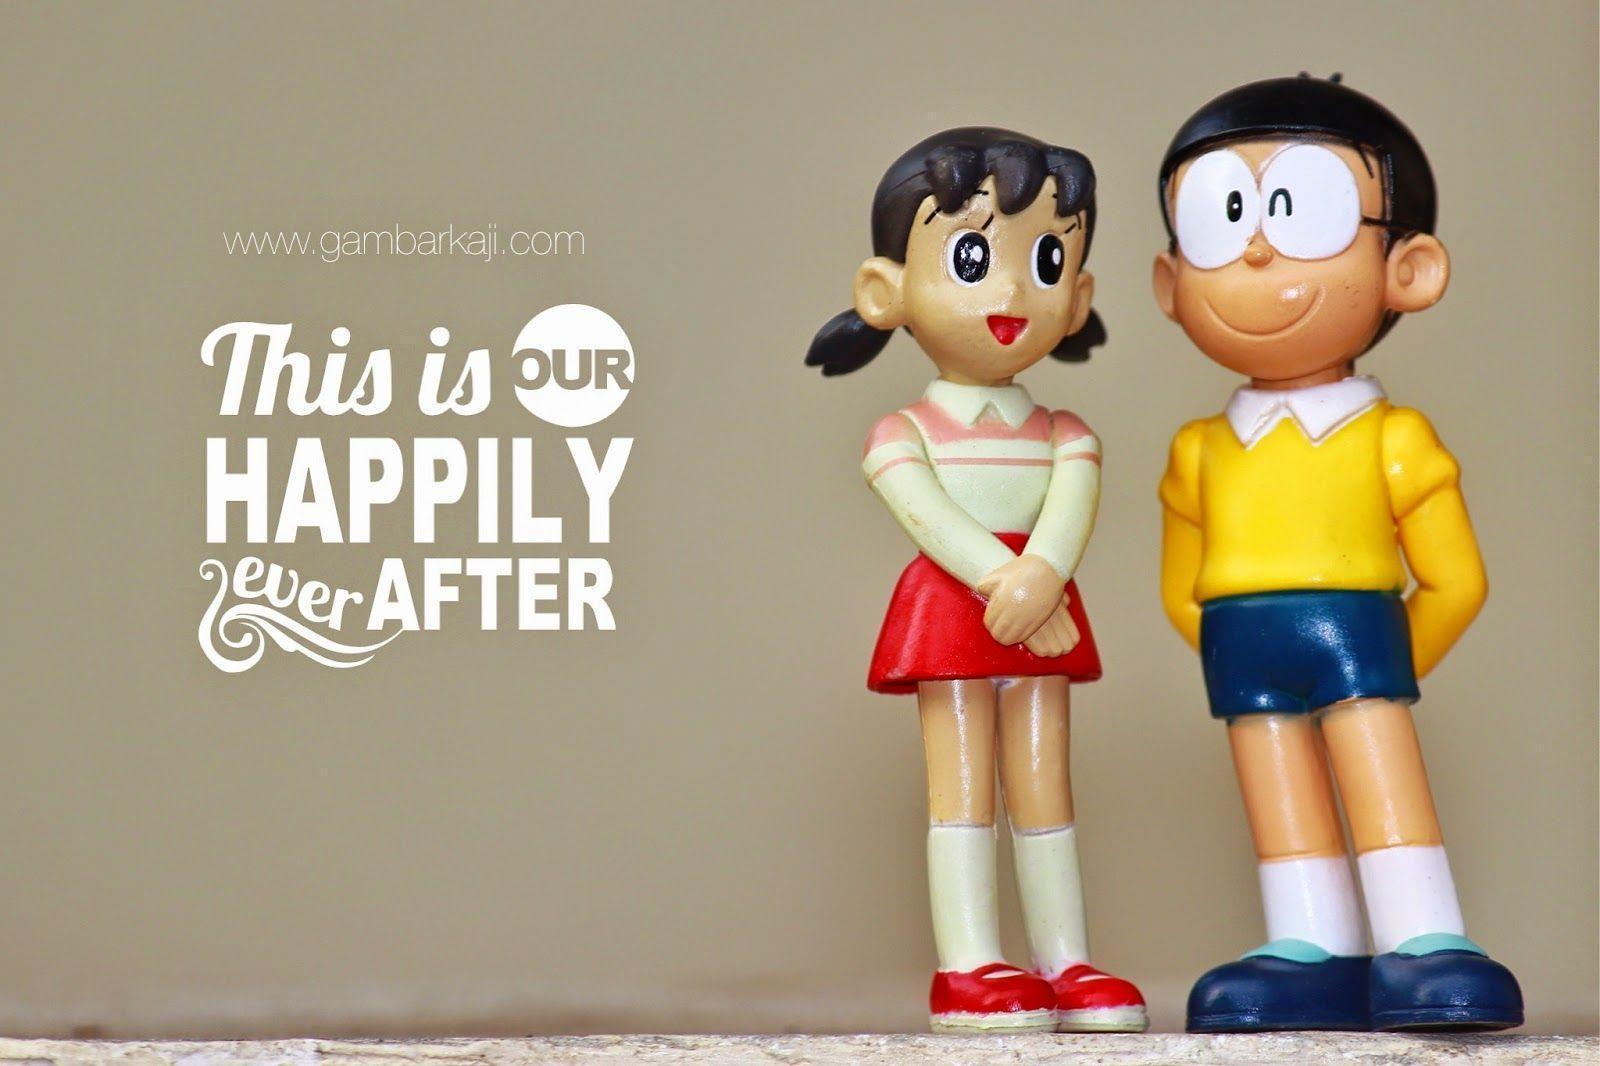 Doraemon Stand By Me 3D High Resolution Image Desktop Backgrounds Free